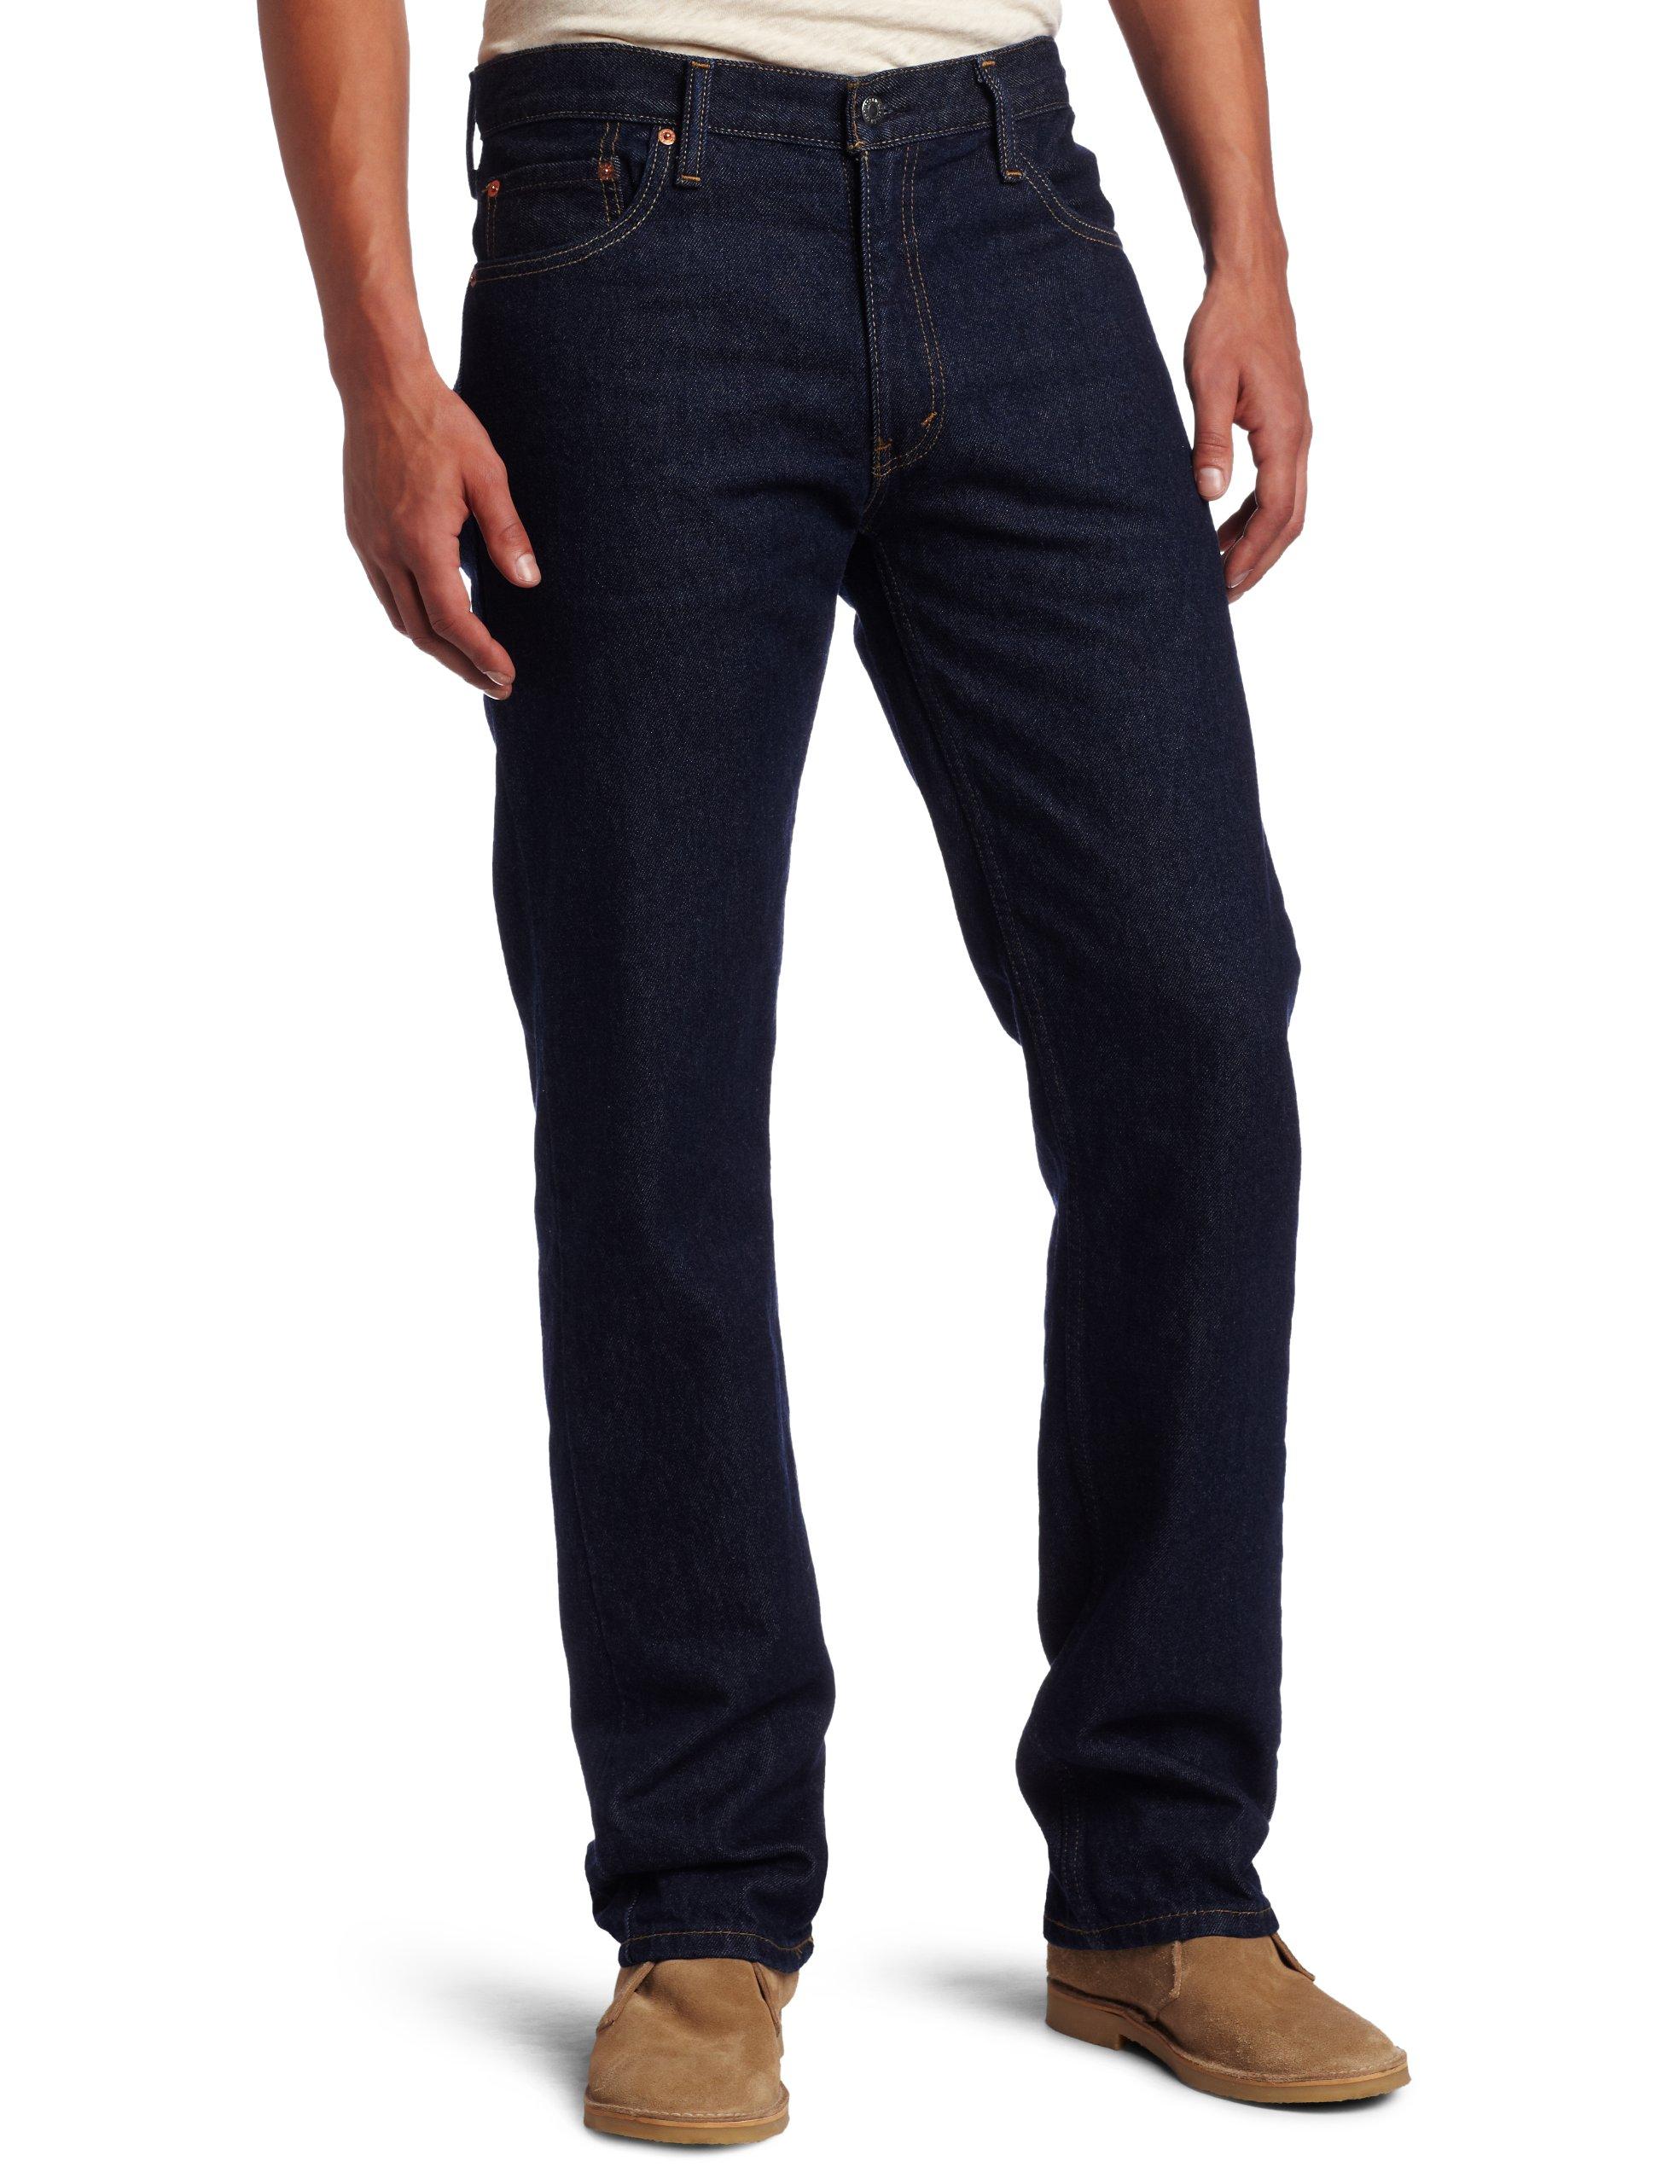 Levi's Men's 505 Regular Fit Jean, Rinse, 32x29